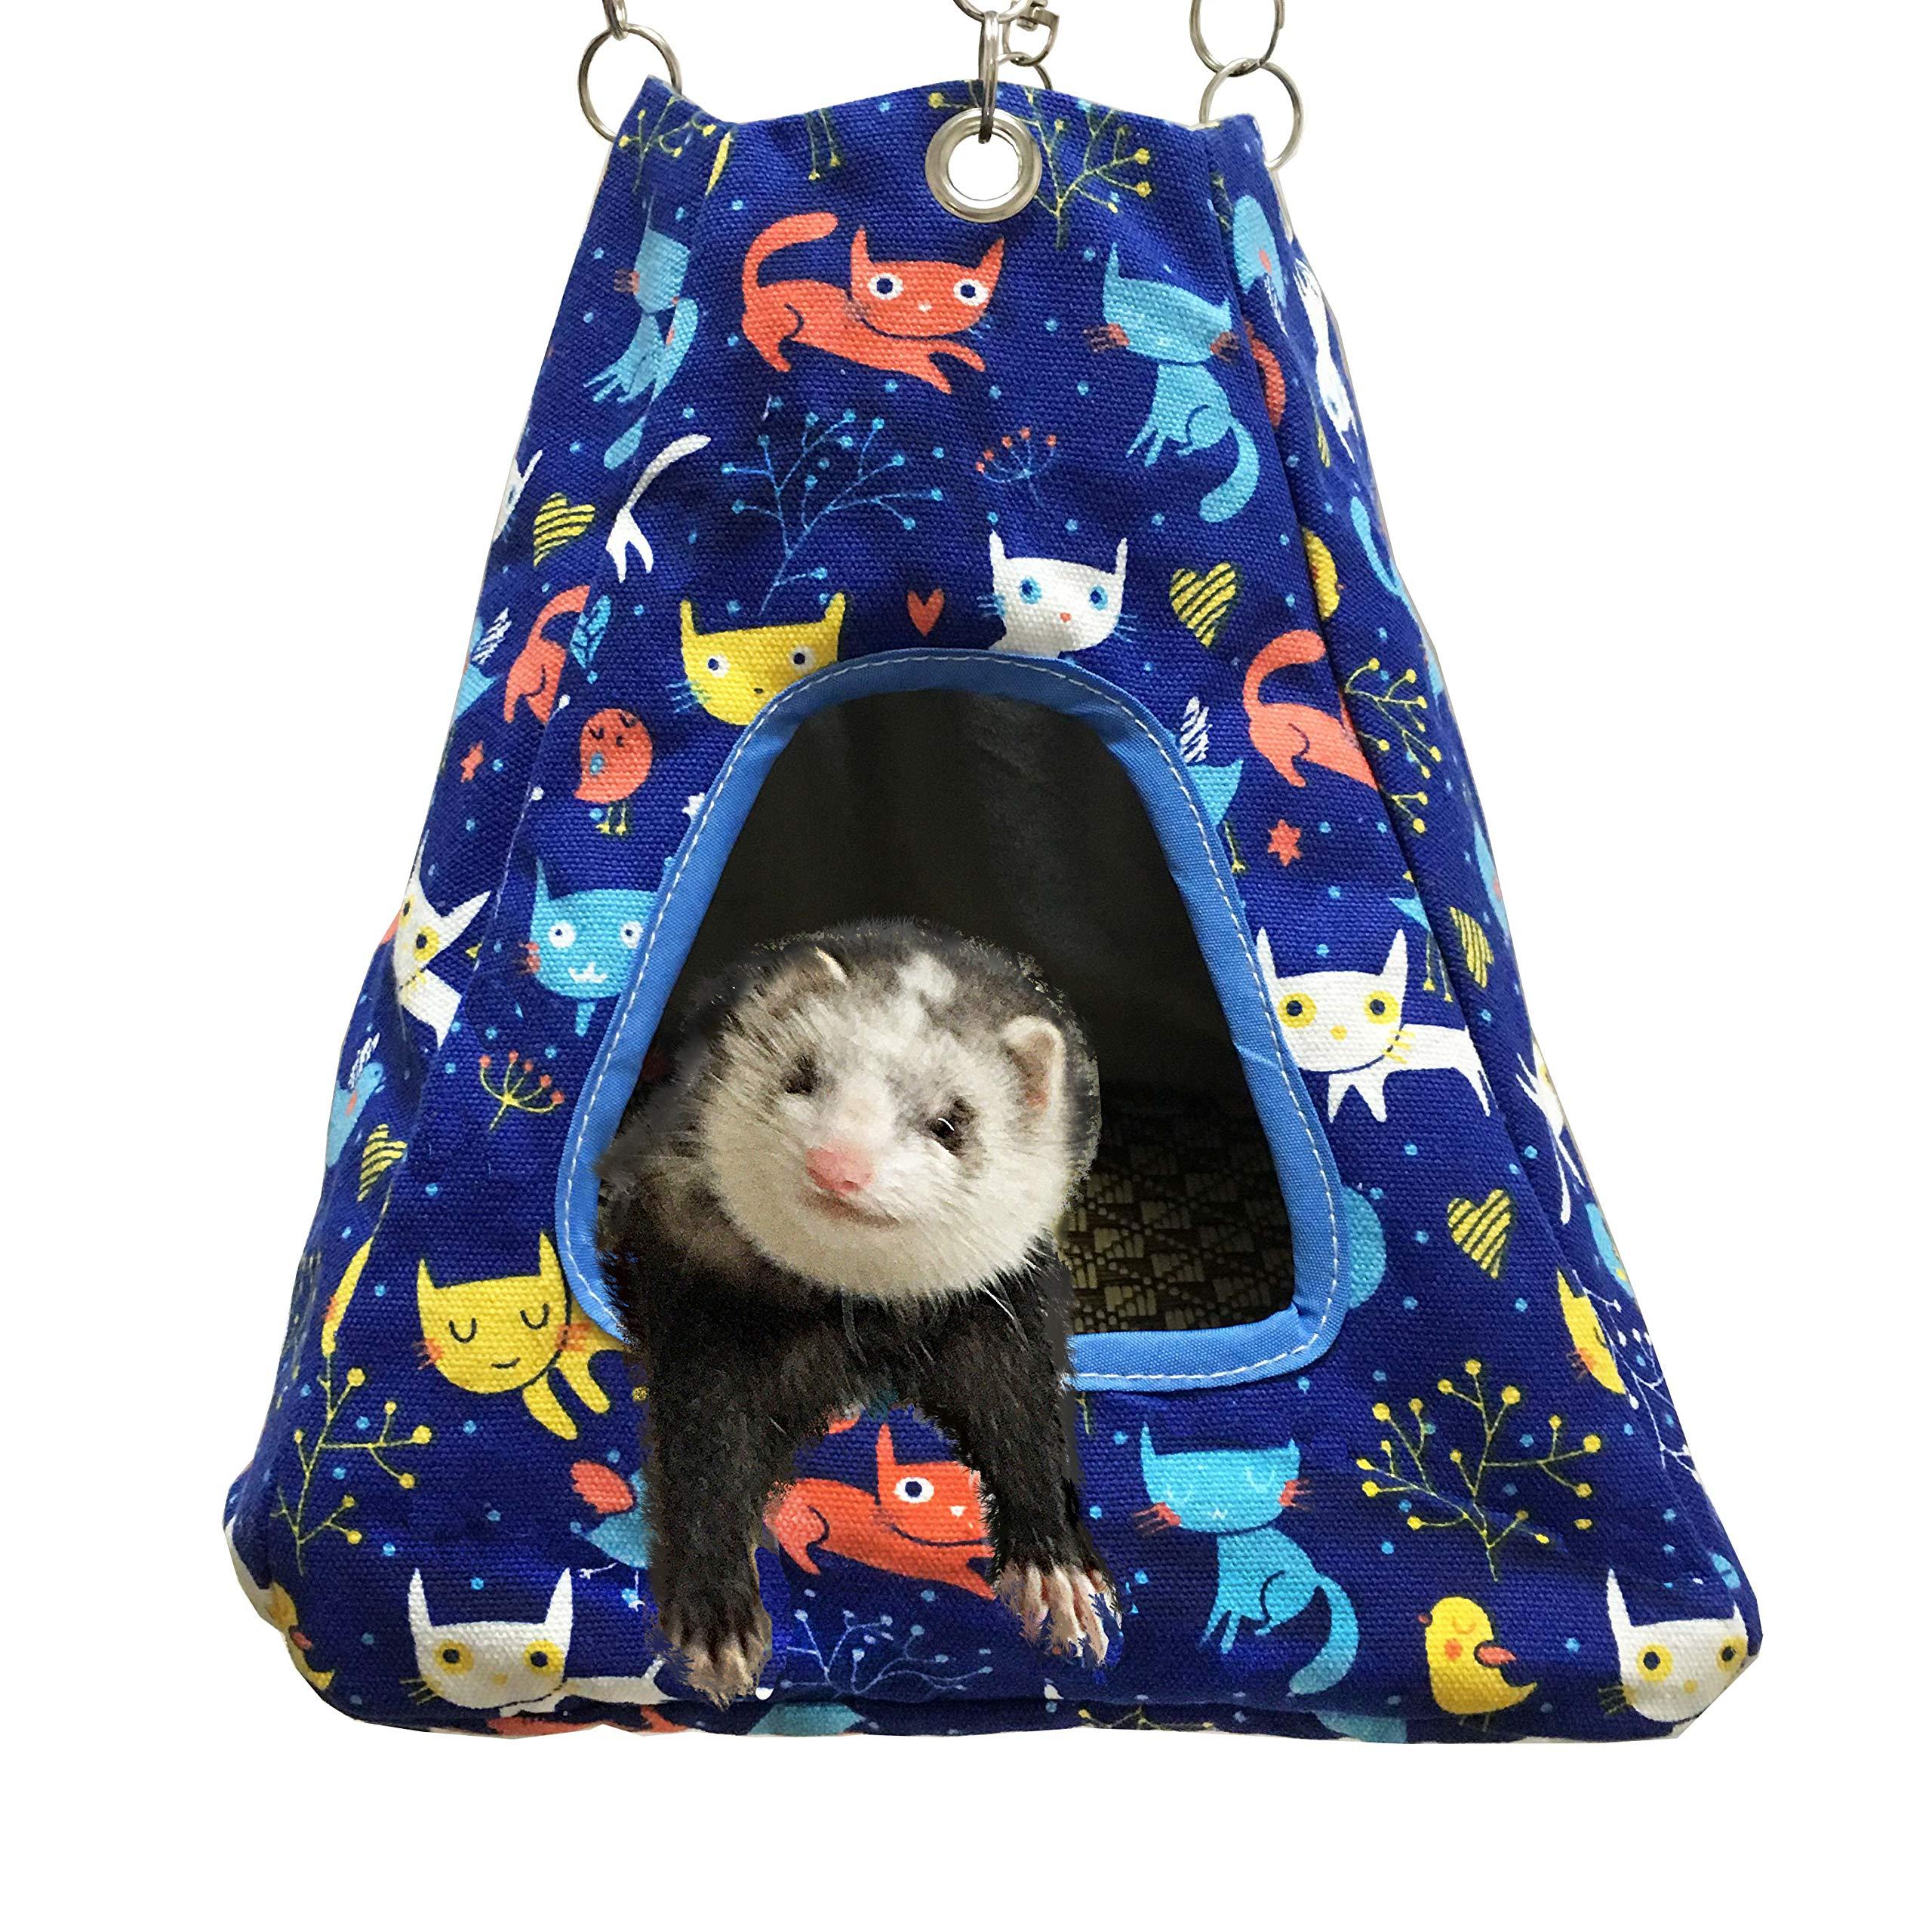 FULUE Small Animal Ferret Rat Guinea Pig Degu Gerbil Mice Hamster Chincilla Hammock Sleeper Cage Accessories (2in1 Blue Tent)